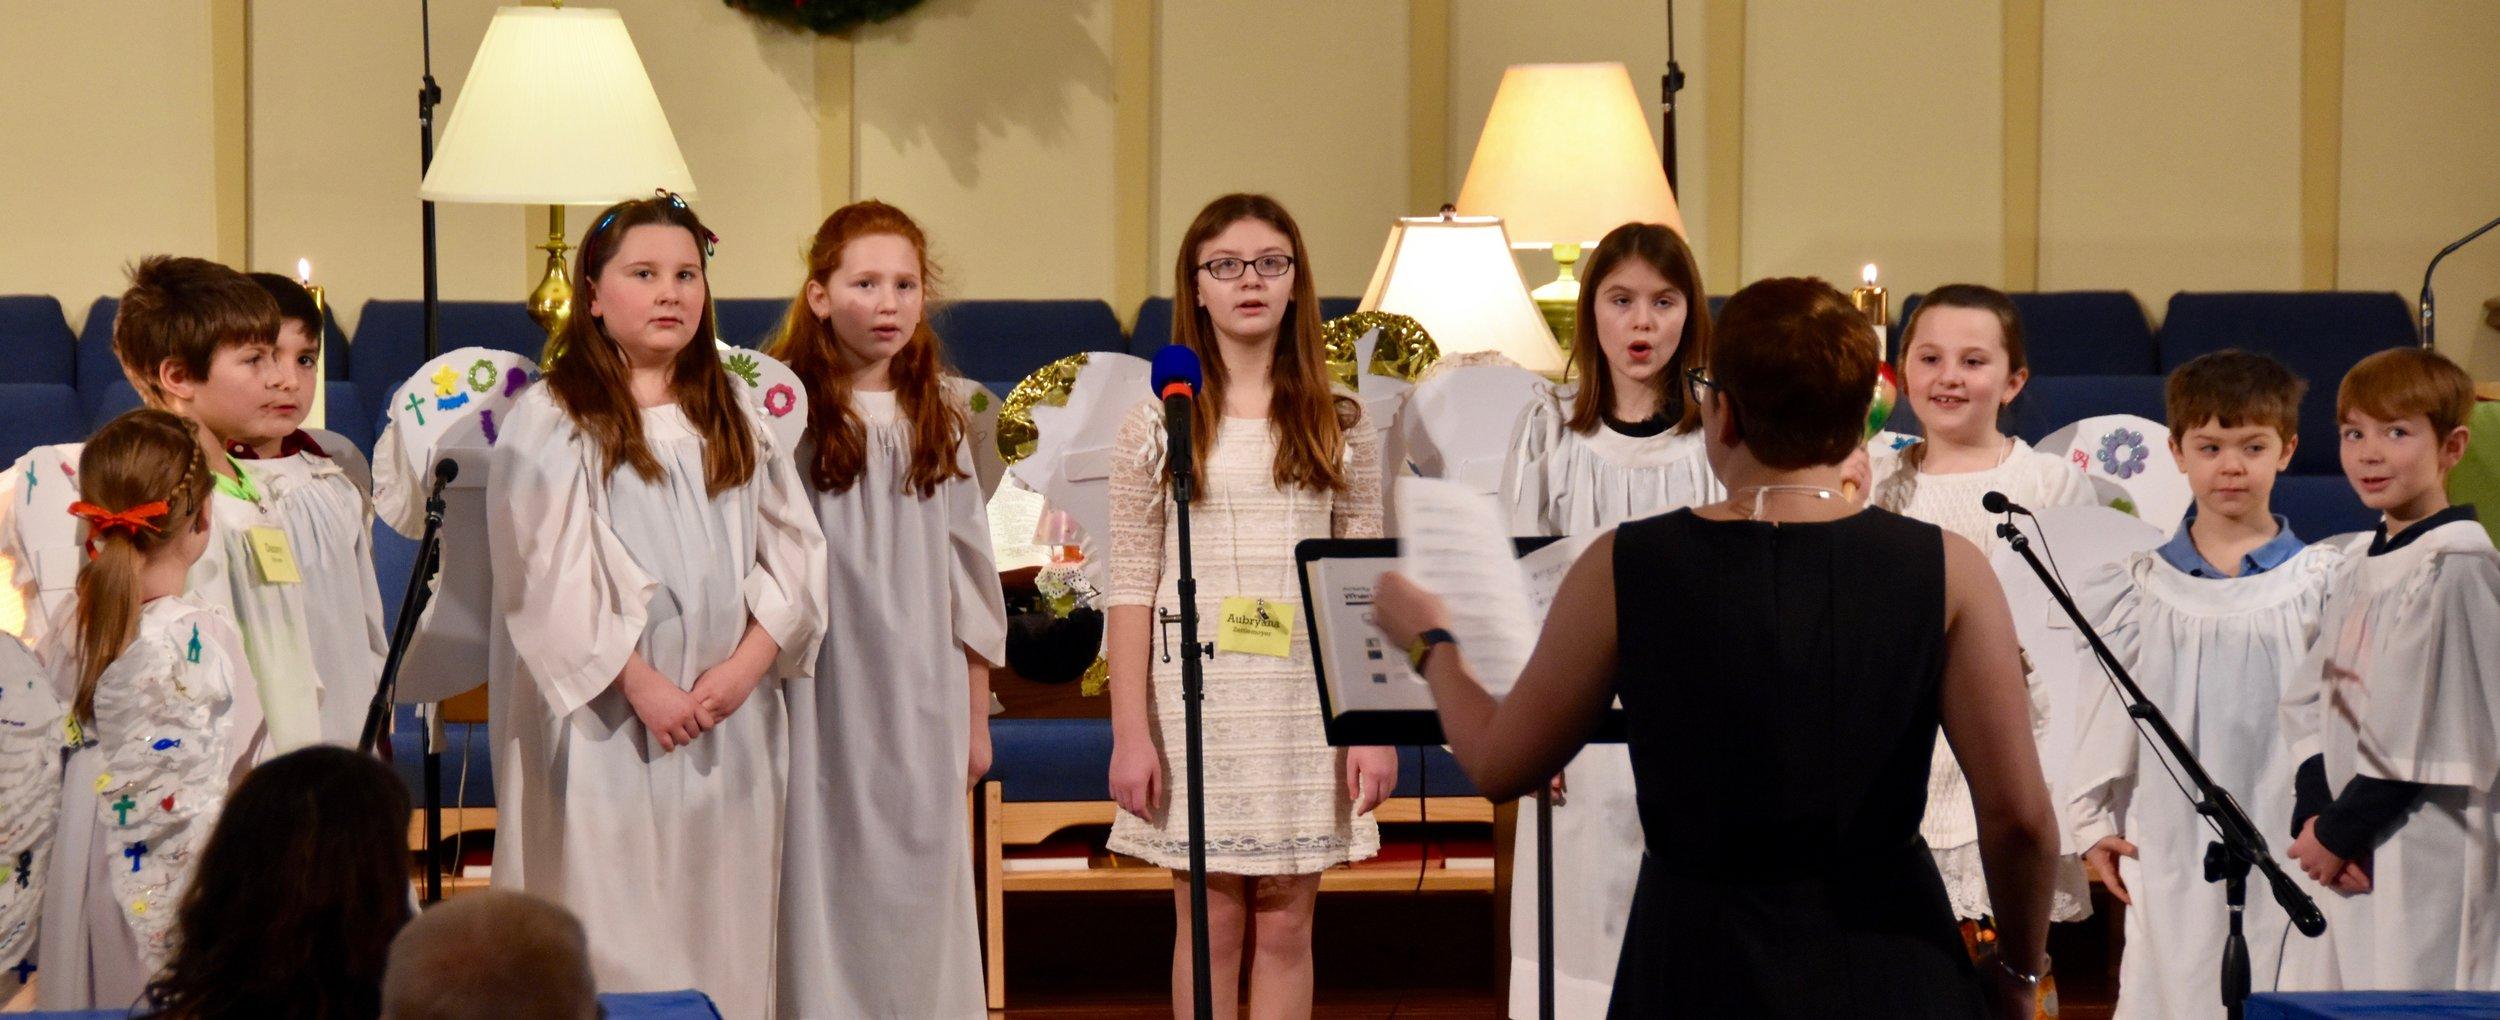 The Joyful Noise Choir in worship.